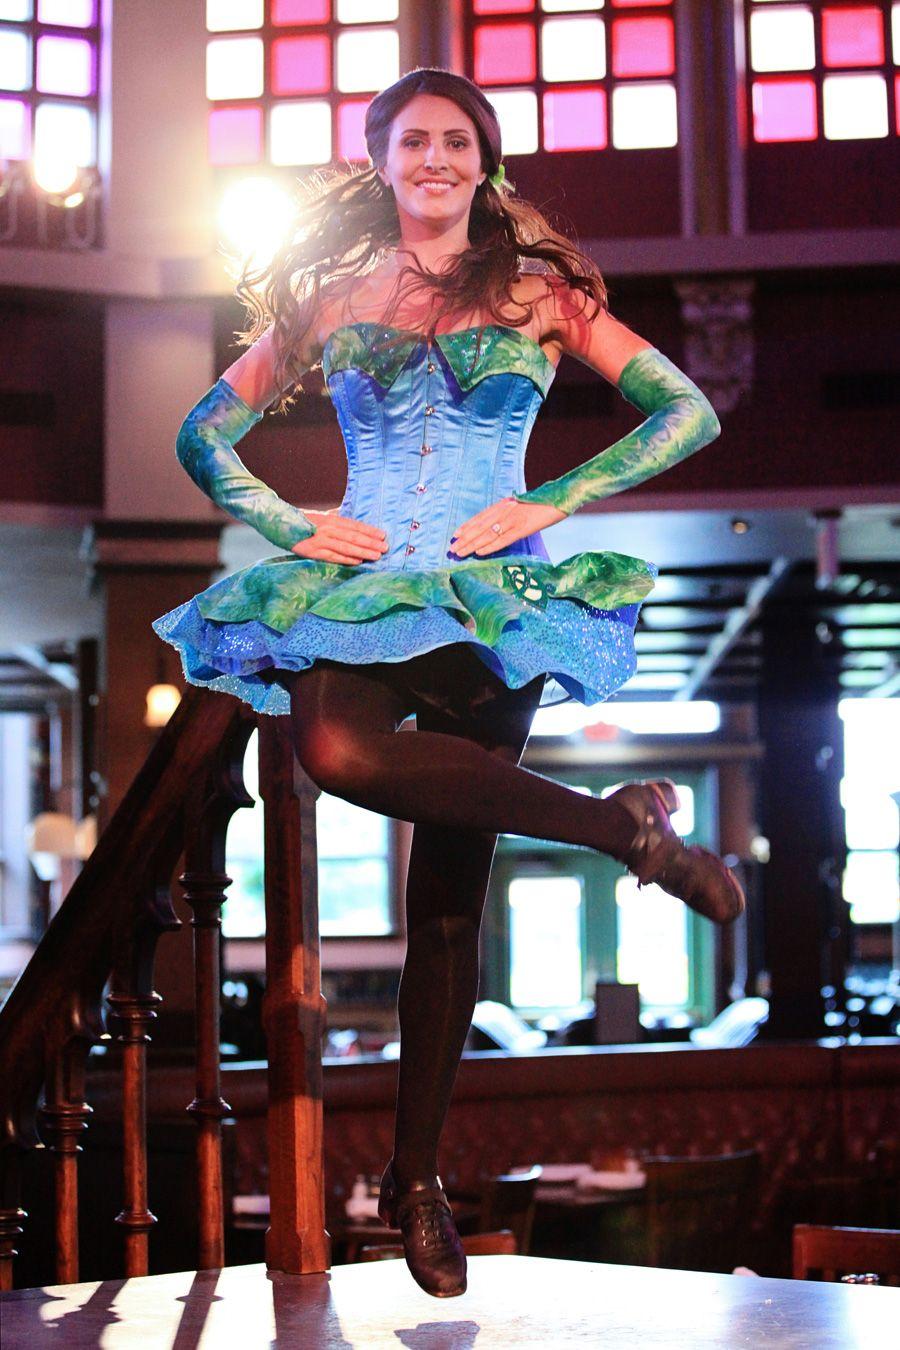 irish mature joy nude Dancer at Raglan Road Irish Pub & Restaurant Pleasure Island....danced here